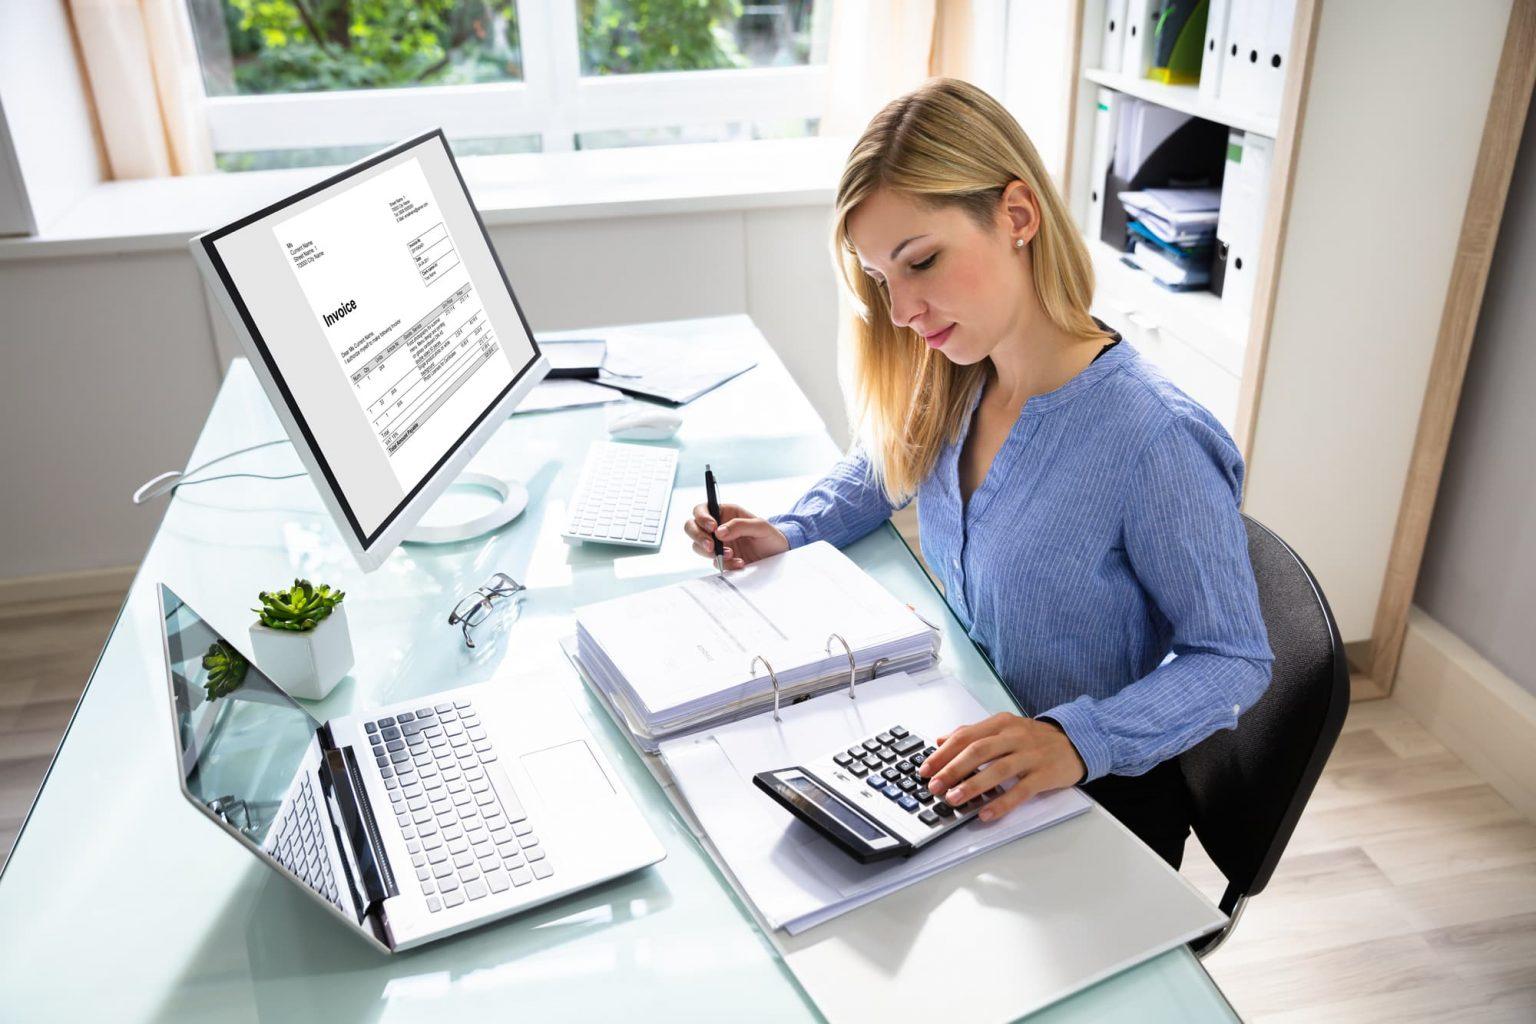 Работа бухгалтеру удаленно вакансии работа удаленно на дому через интернет вакансии